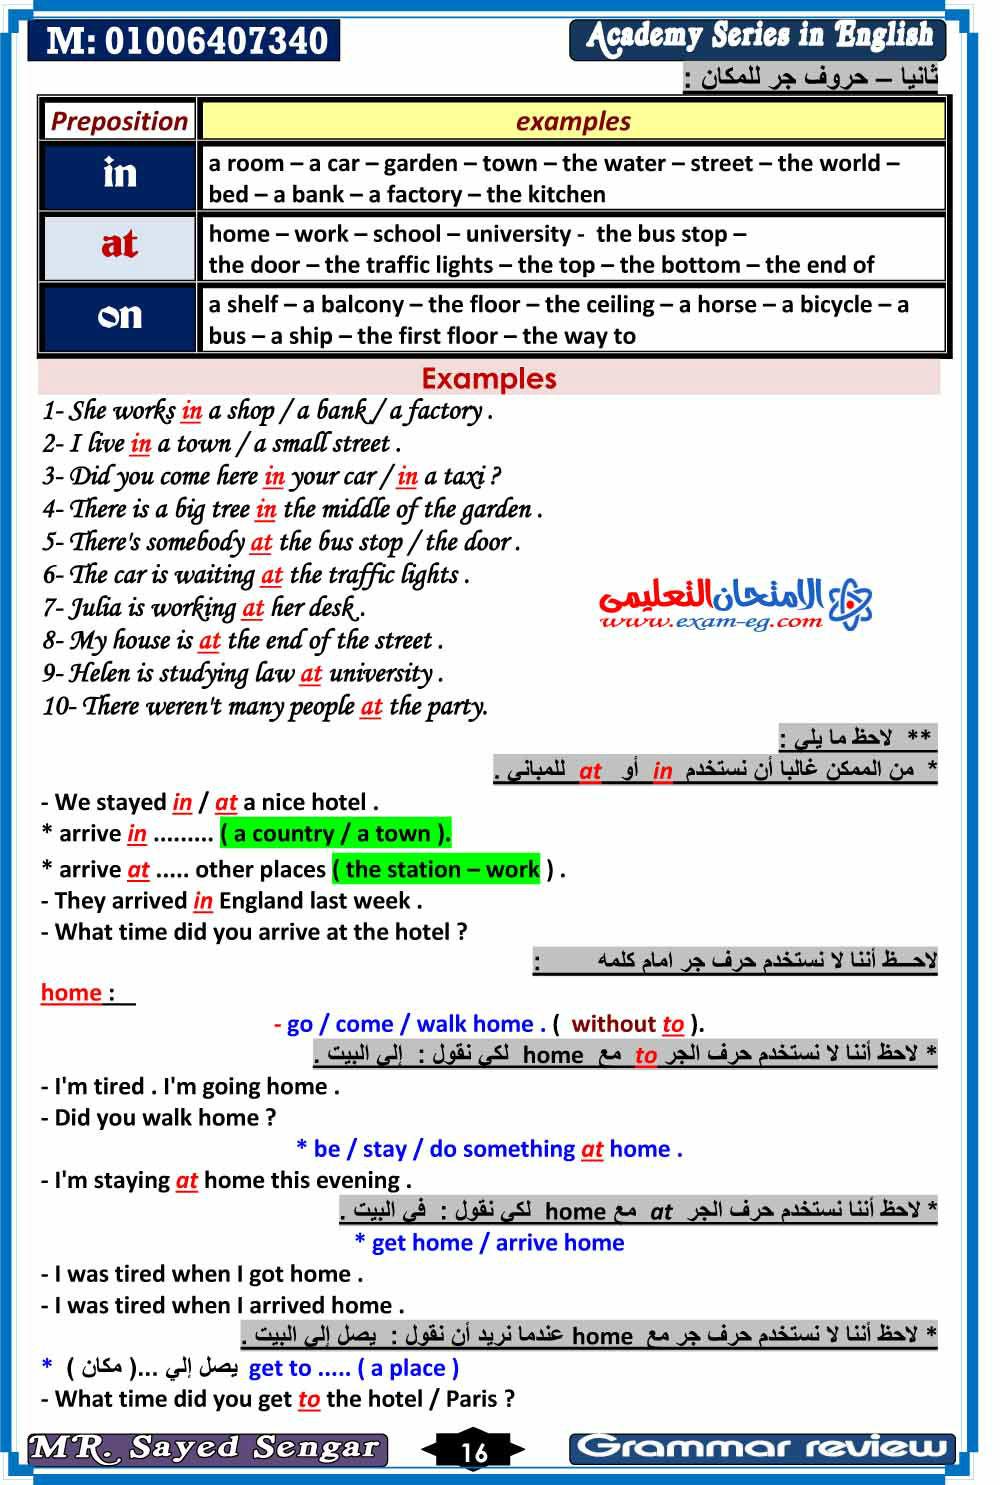 exam-eg.com_14404698617316.jpg